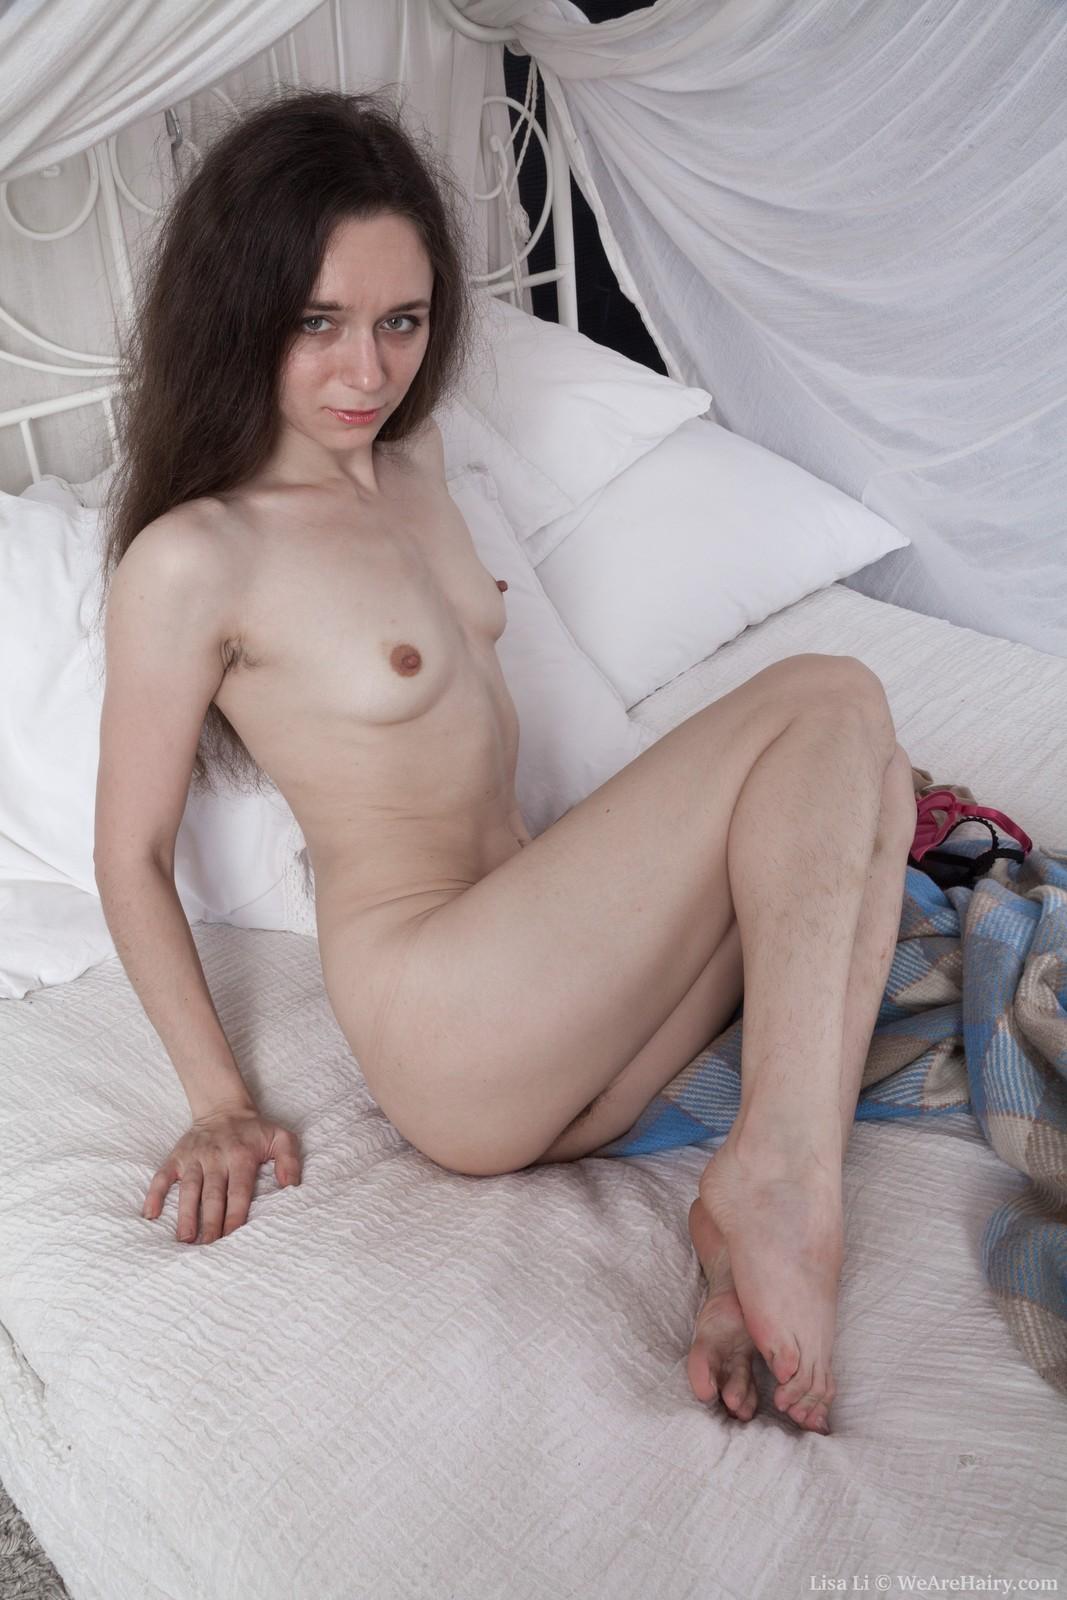 LisaLi_RedLingerPlaidBed_035